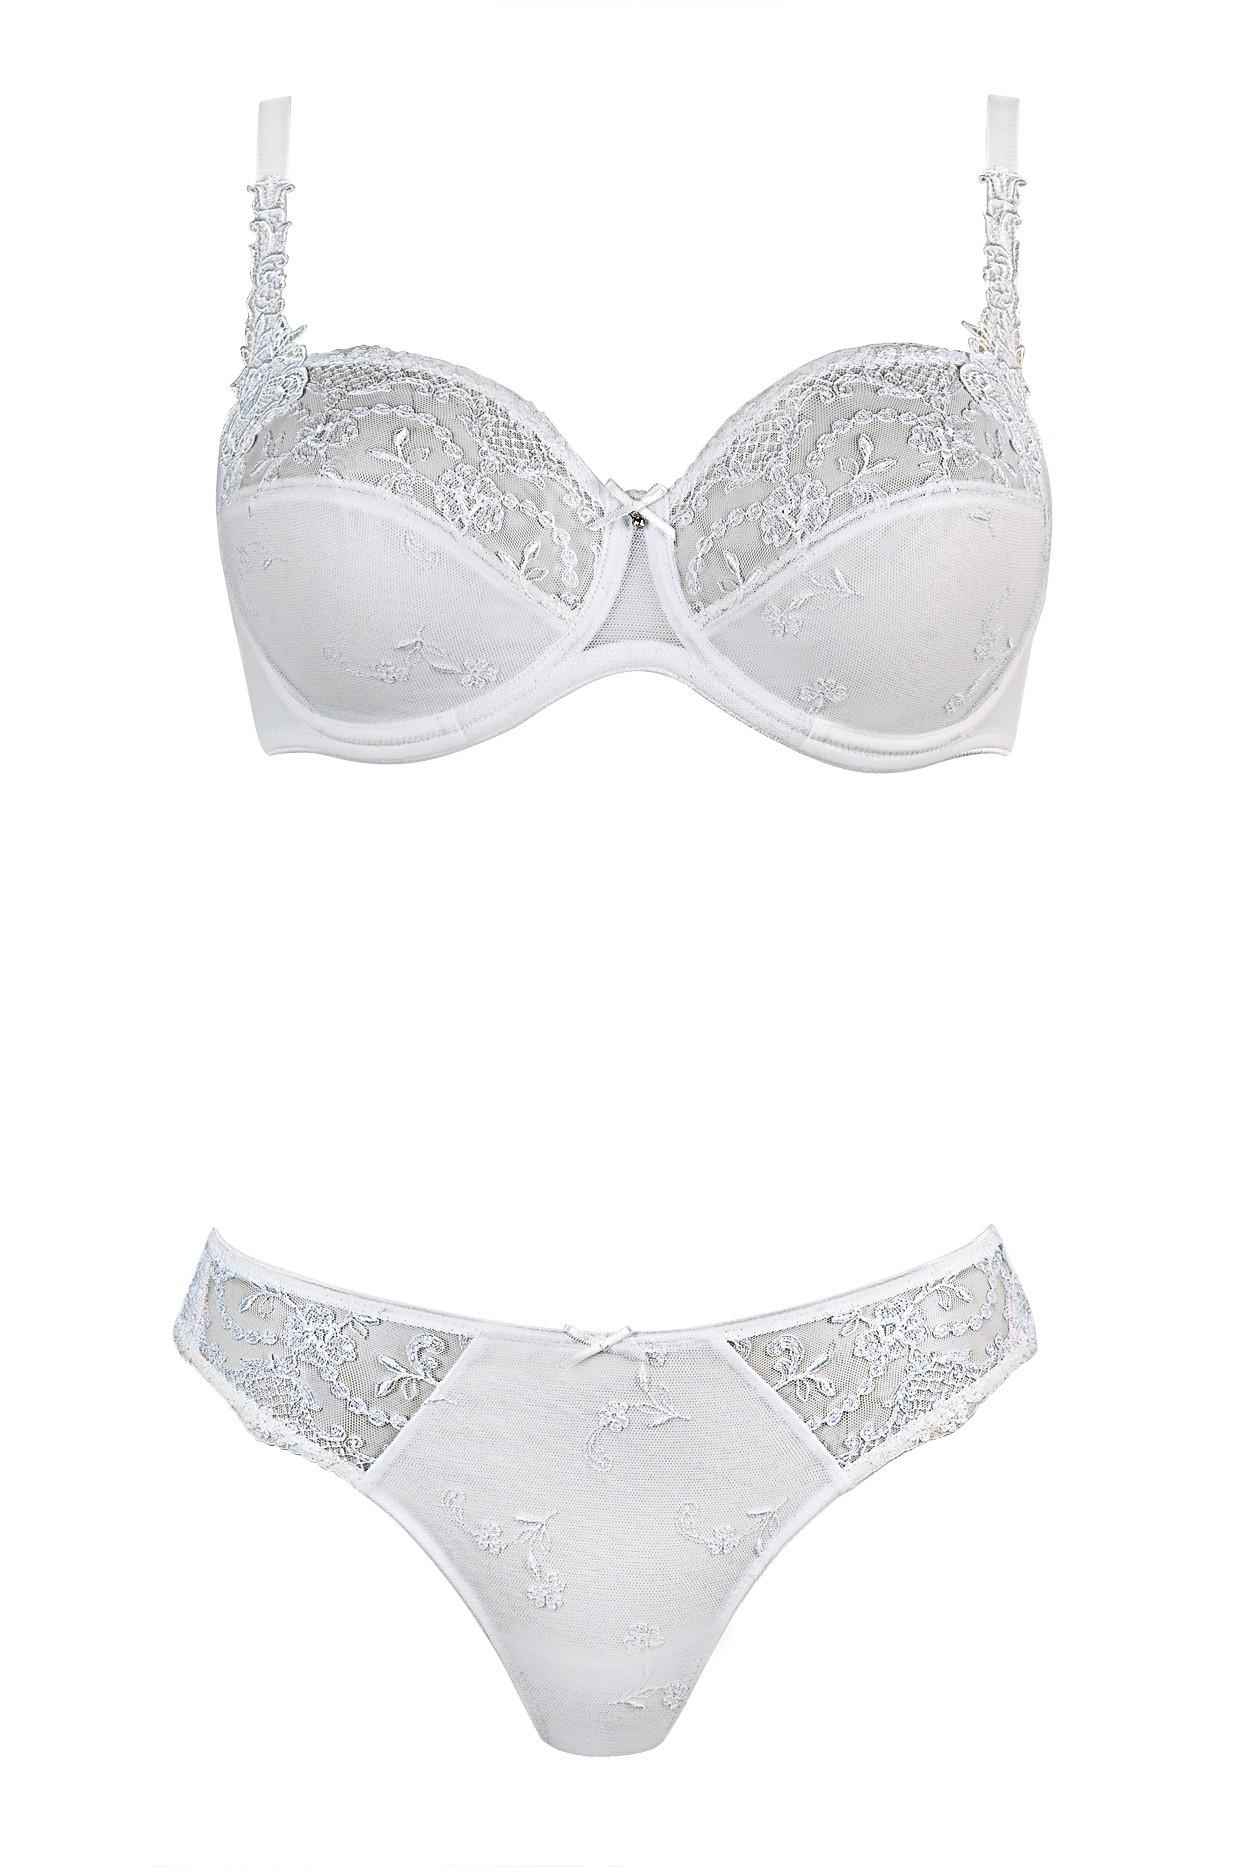 Tanga Conturelle 80116-Felina barva: bílá, velikost: 38